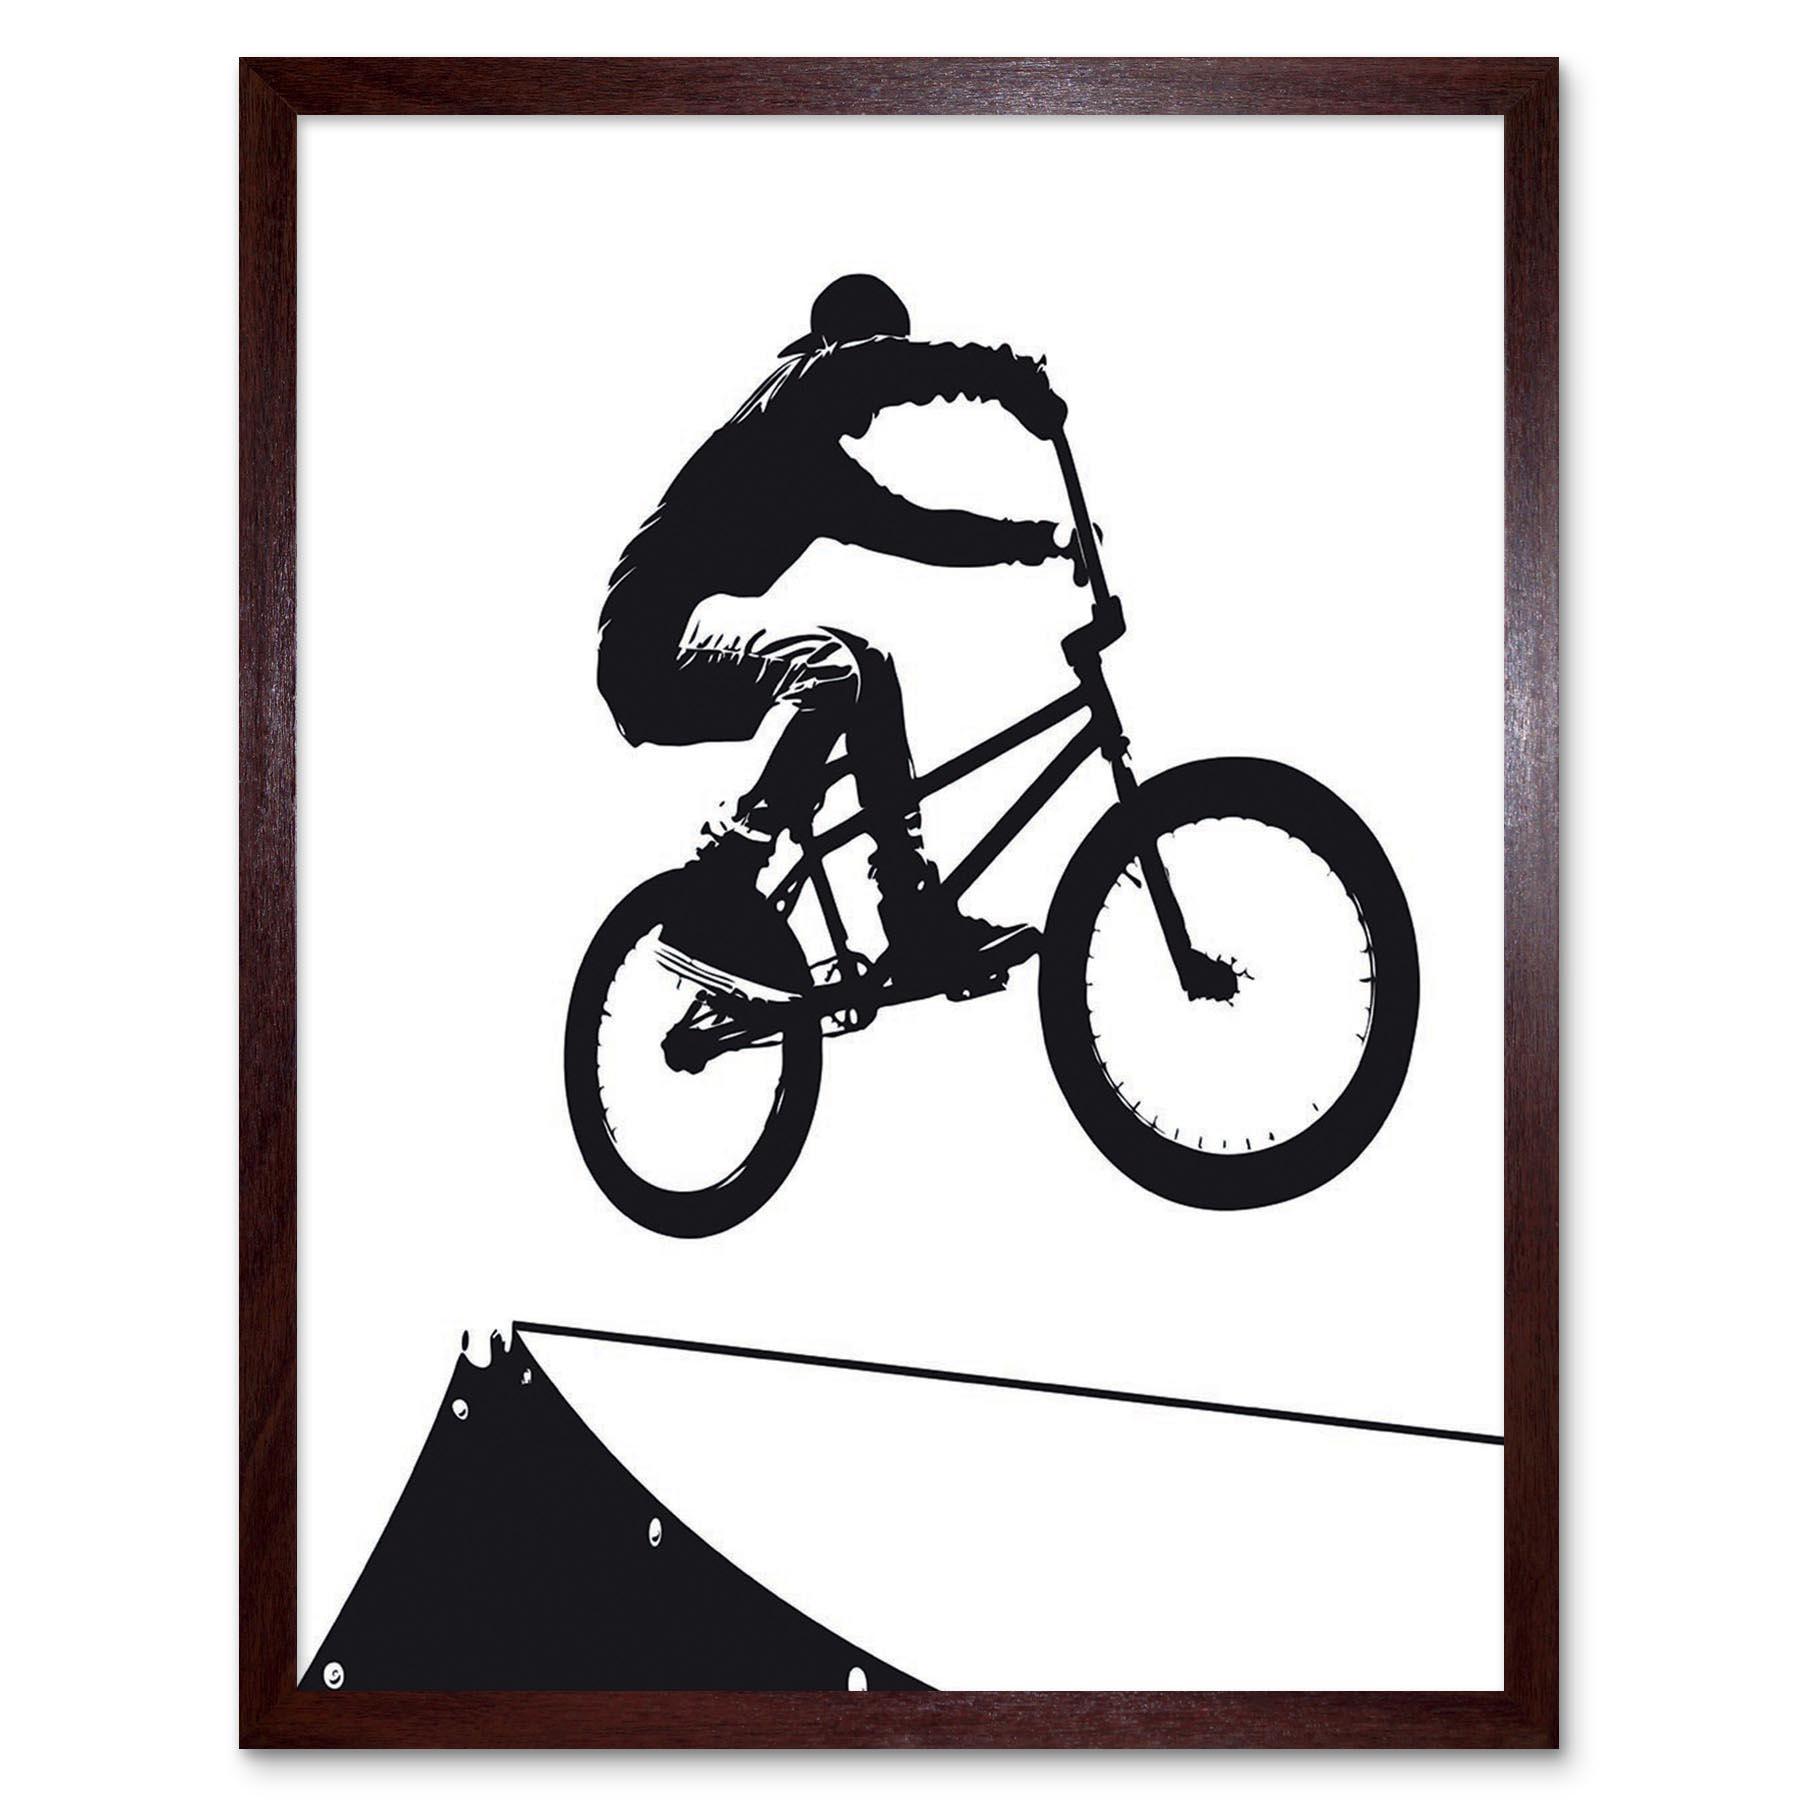 Indexbild 7 - Painting Sport Bmx Bike Bicycle Jump Air Ramp Black White 12X16 Framed Art Print